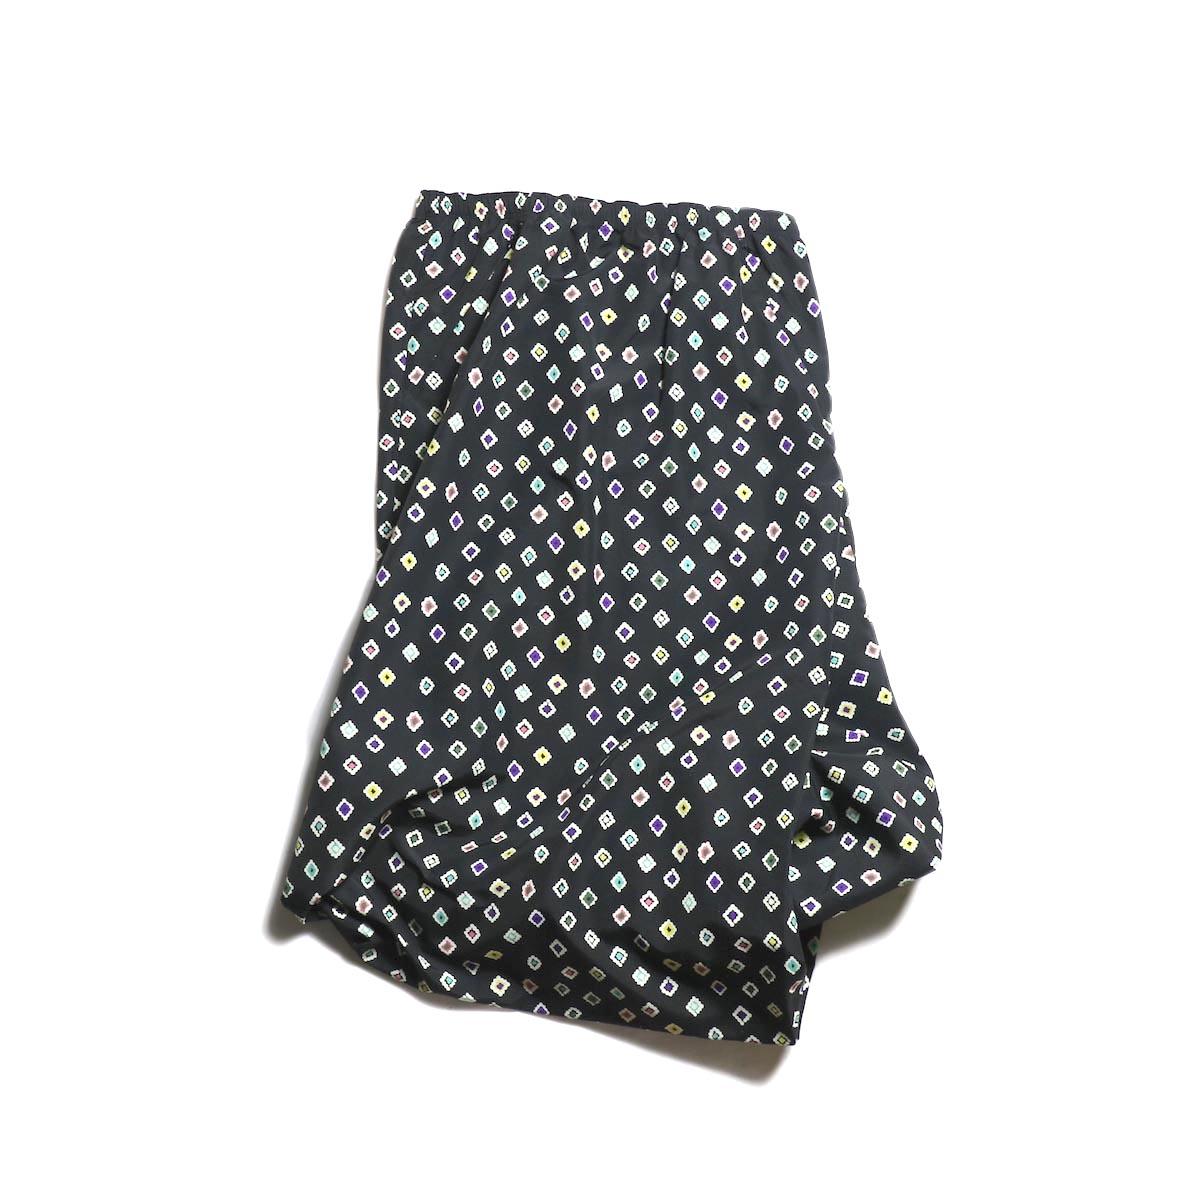 Needles(Ladie's) / Conti Skirt -Nylon Tussore/Print (Black)